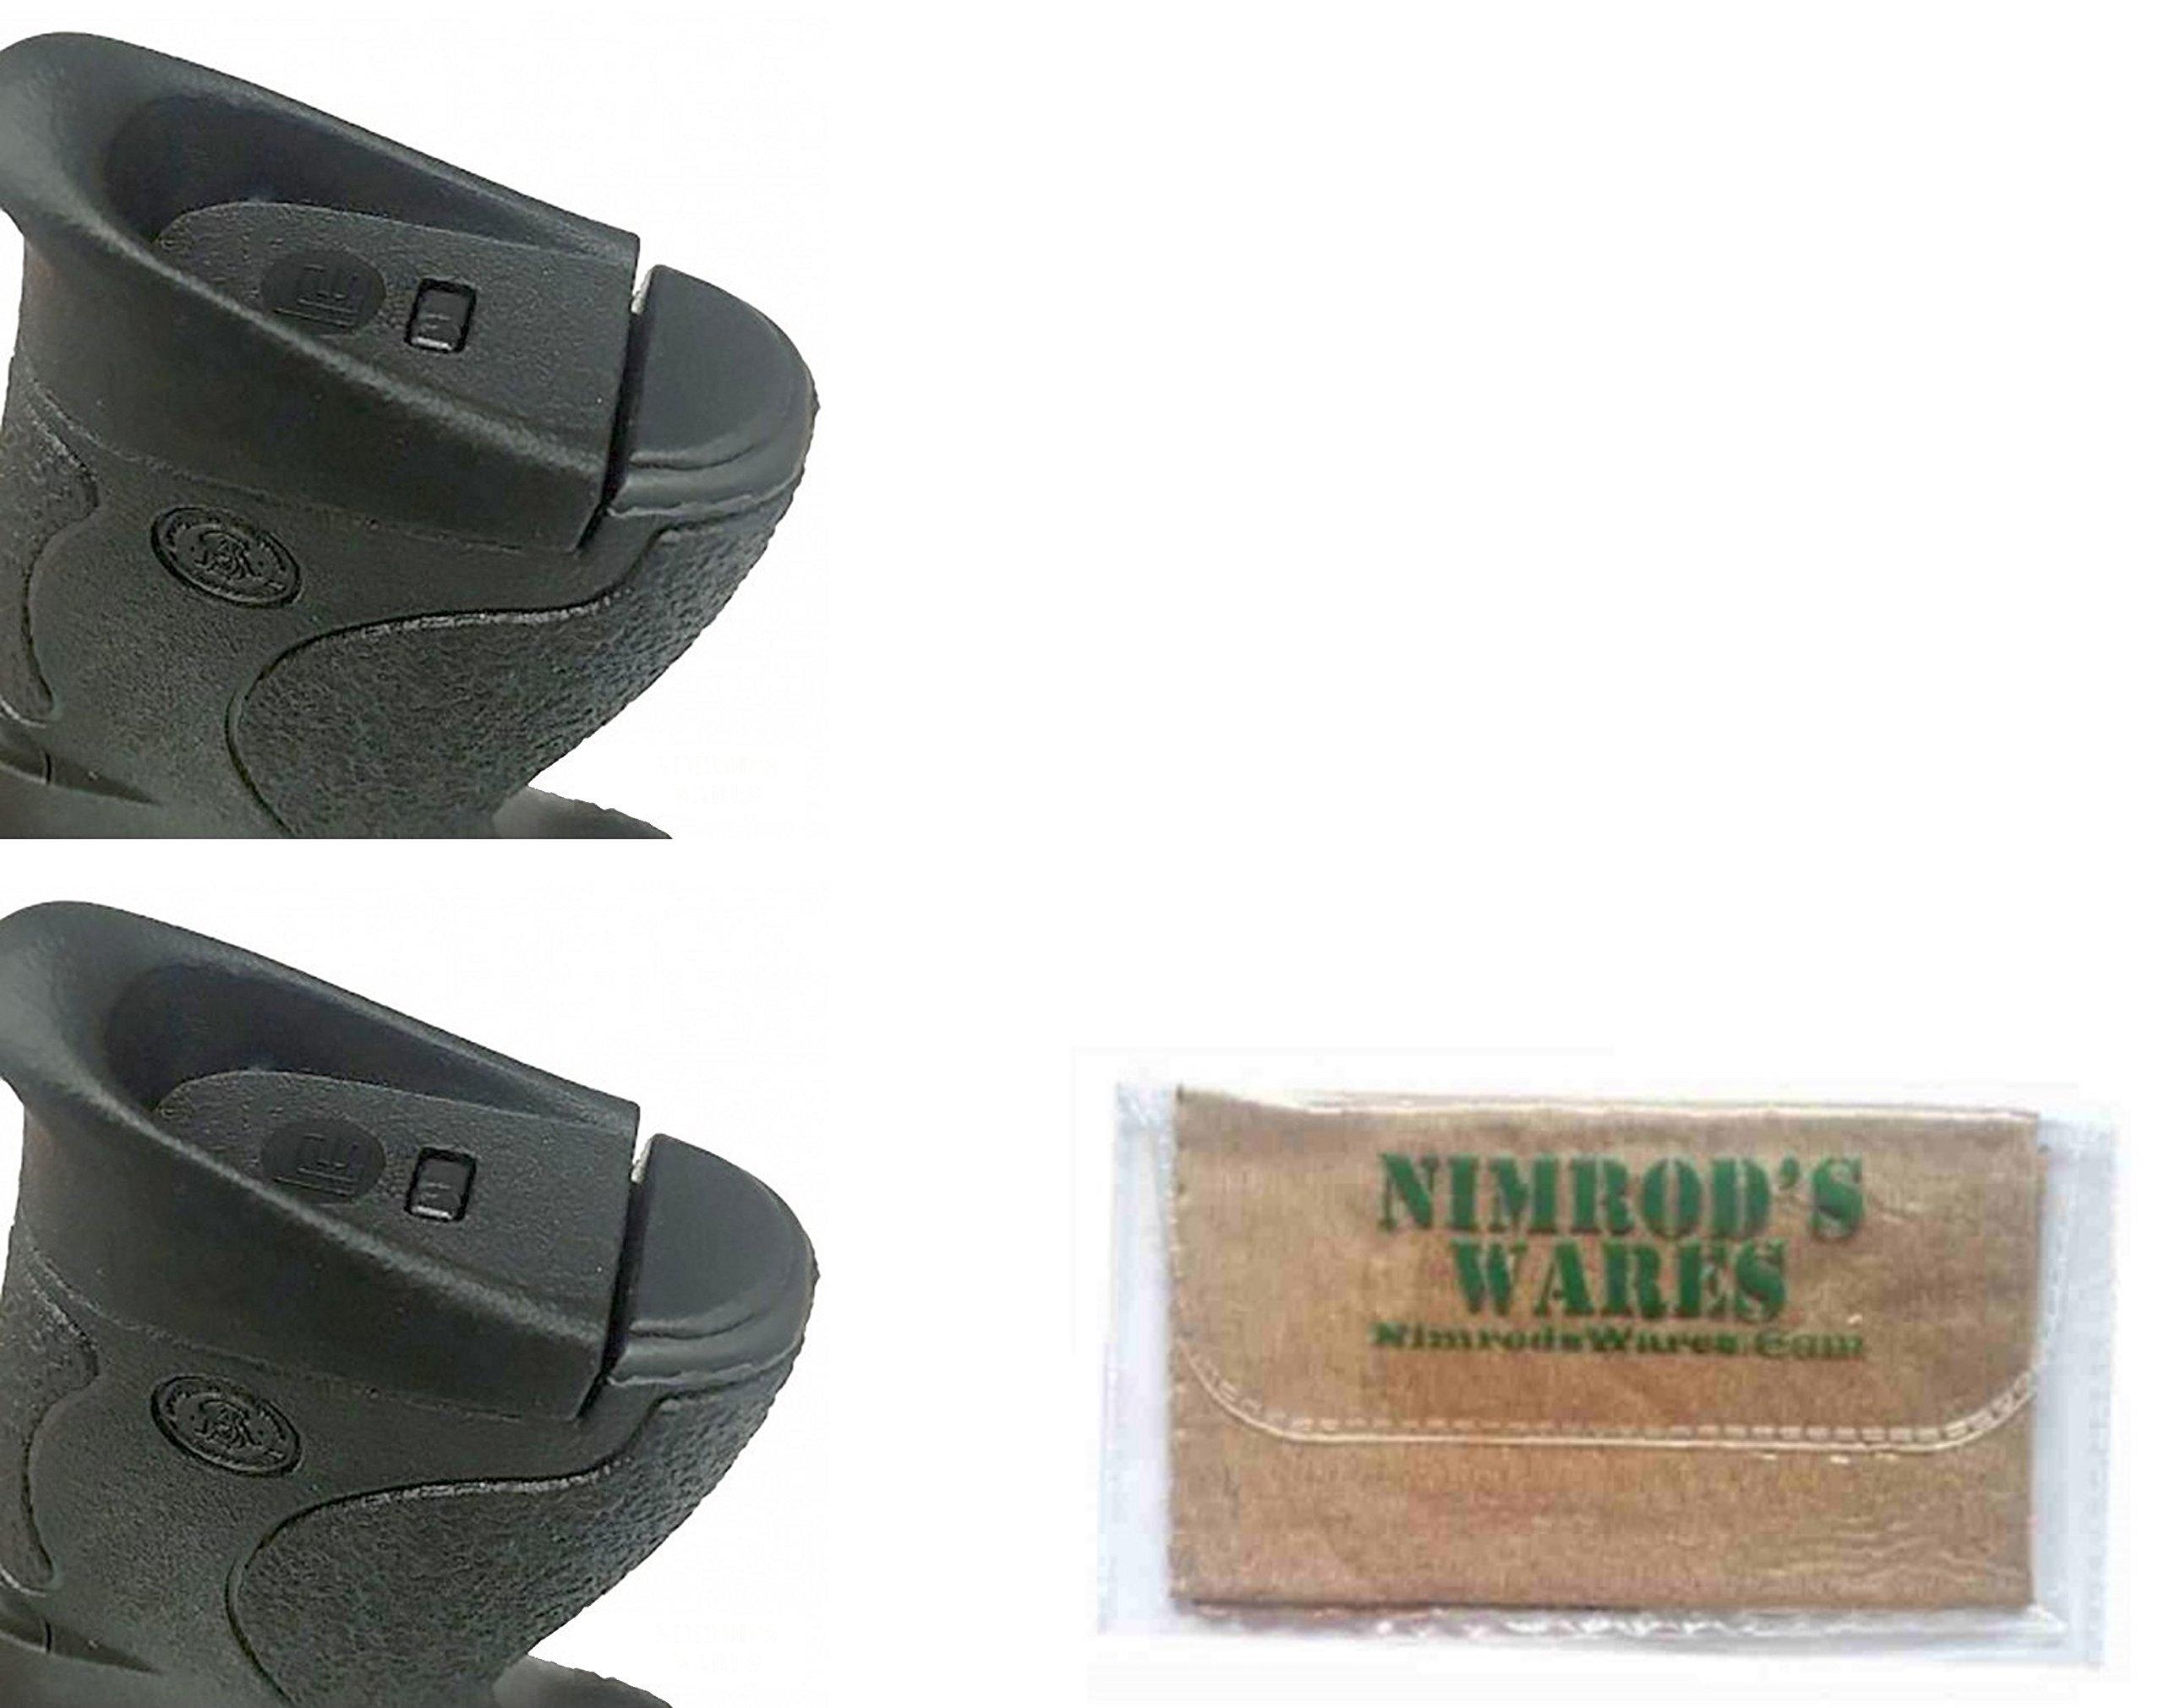 2-Pack Pearce Grip S&W M&P SHIELD Grip Frame INSERT 9mm .40 PG-FIMPS + Nimrod's Wares Microfiber Cloth